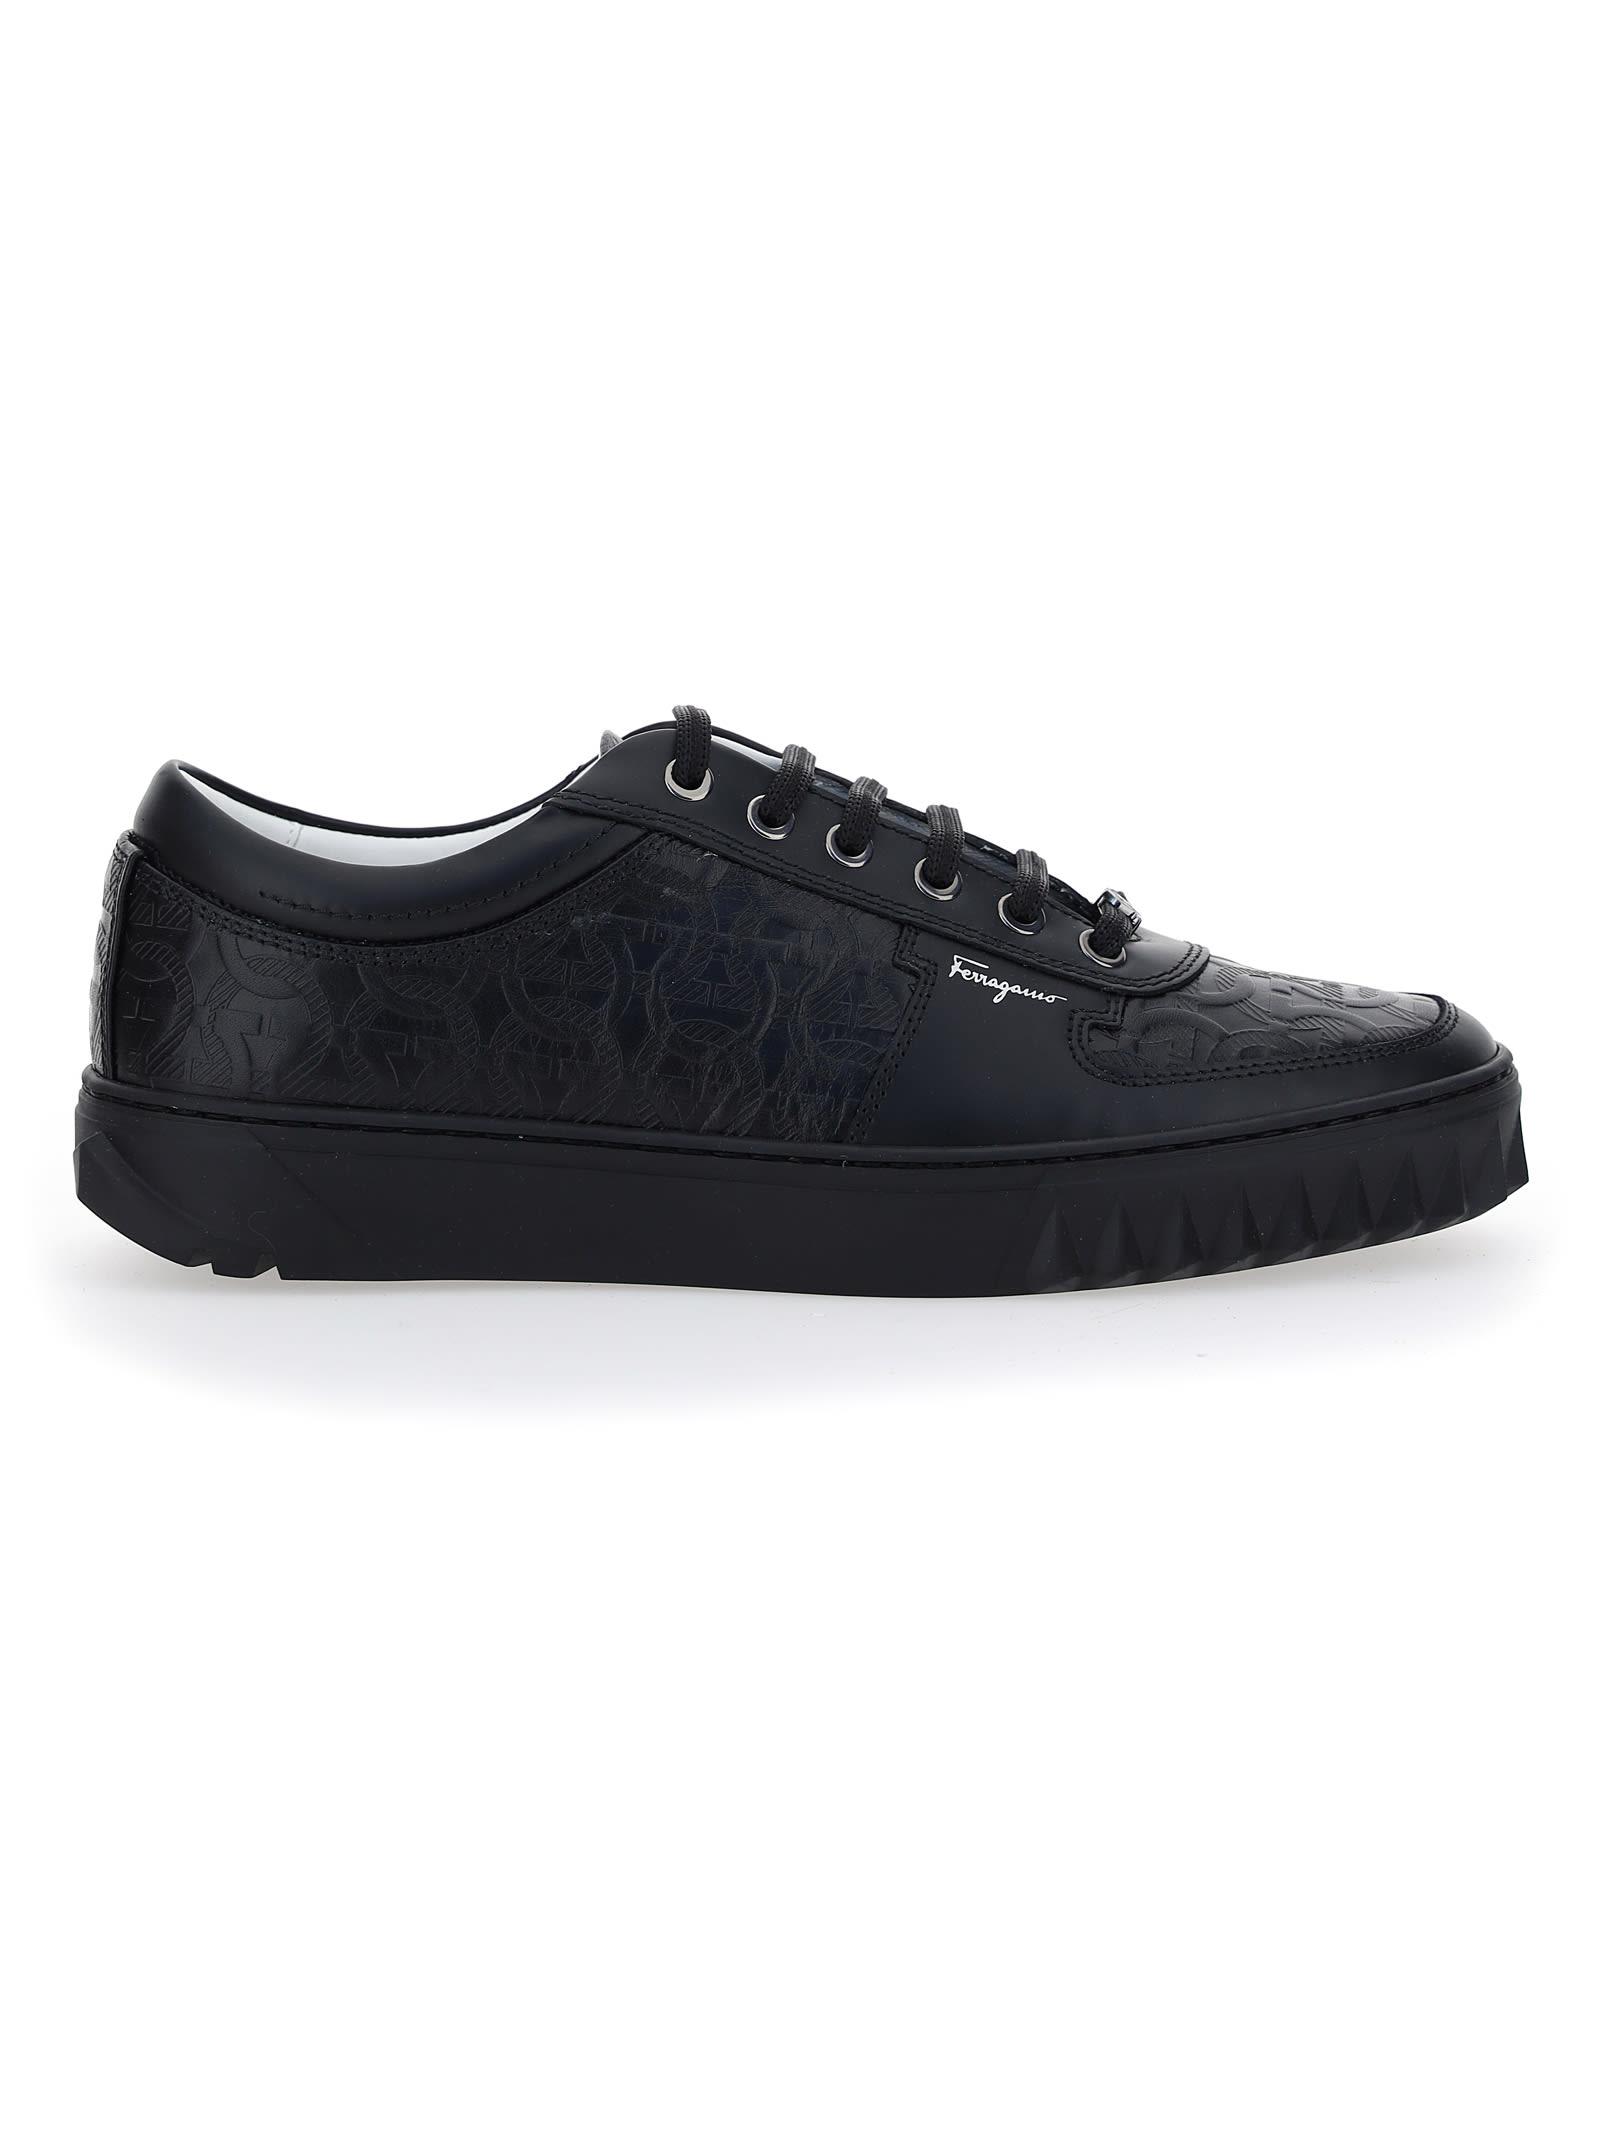 Savatore Ferragamo Sneakers